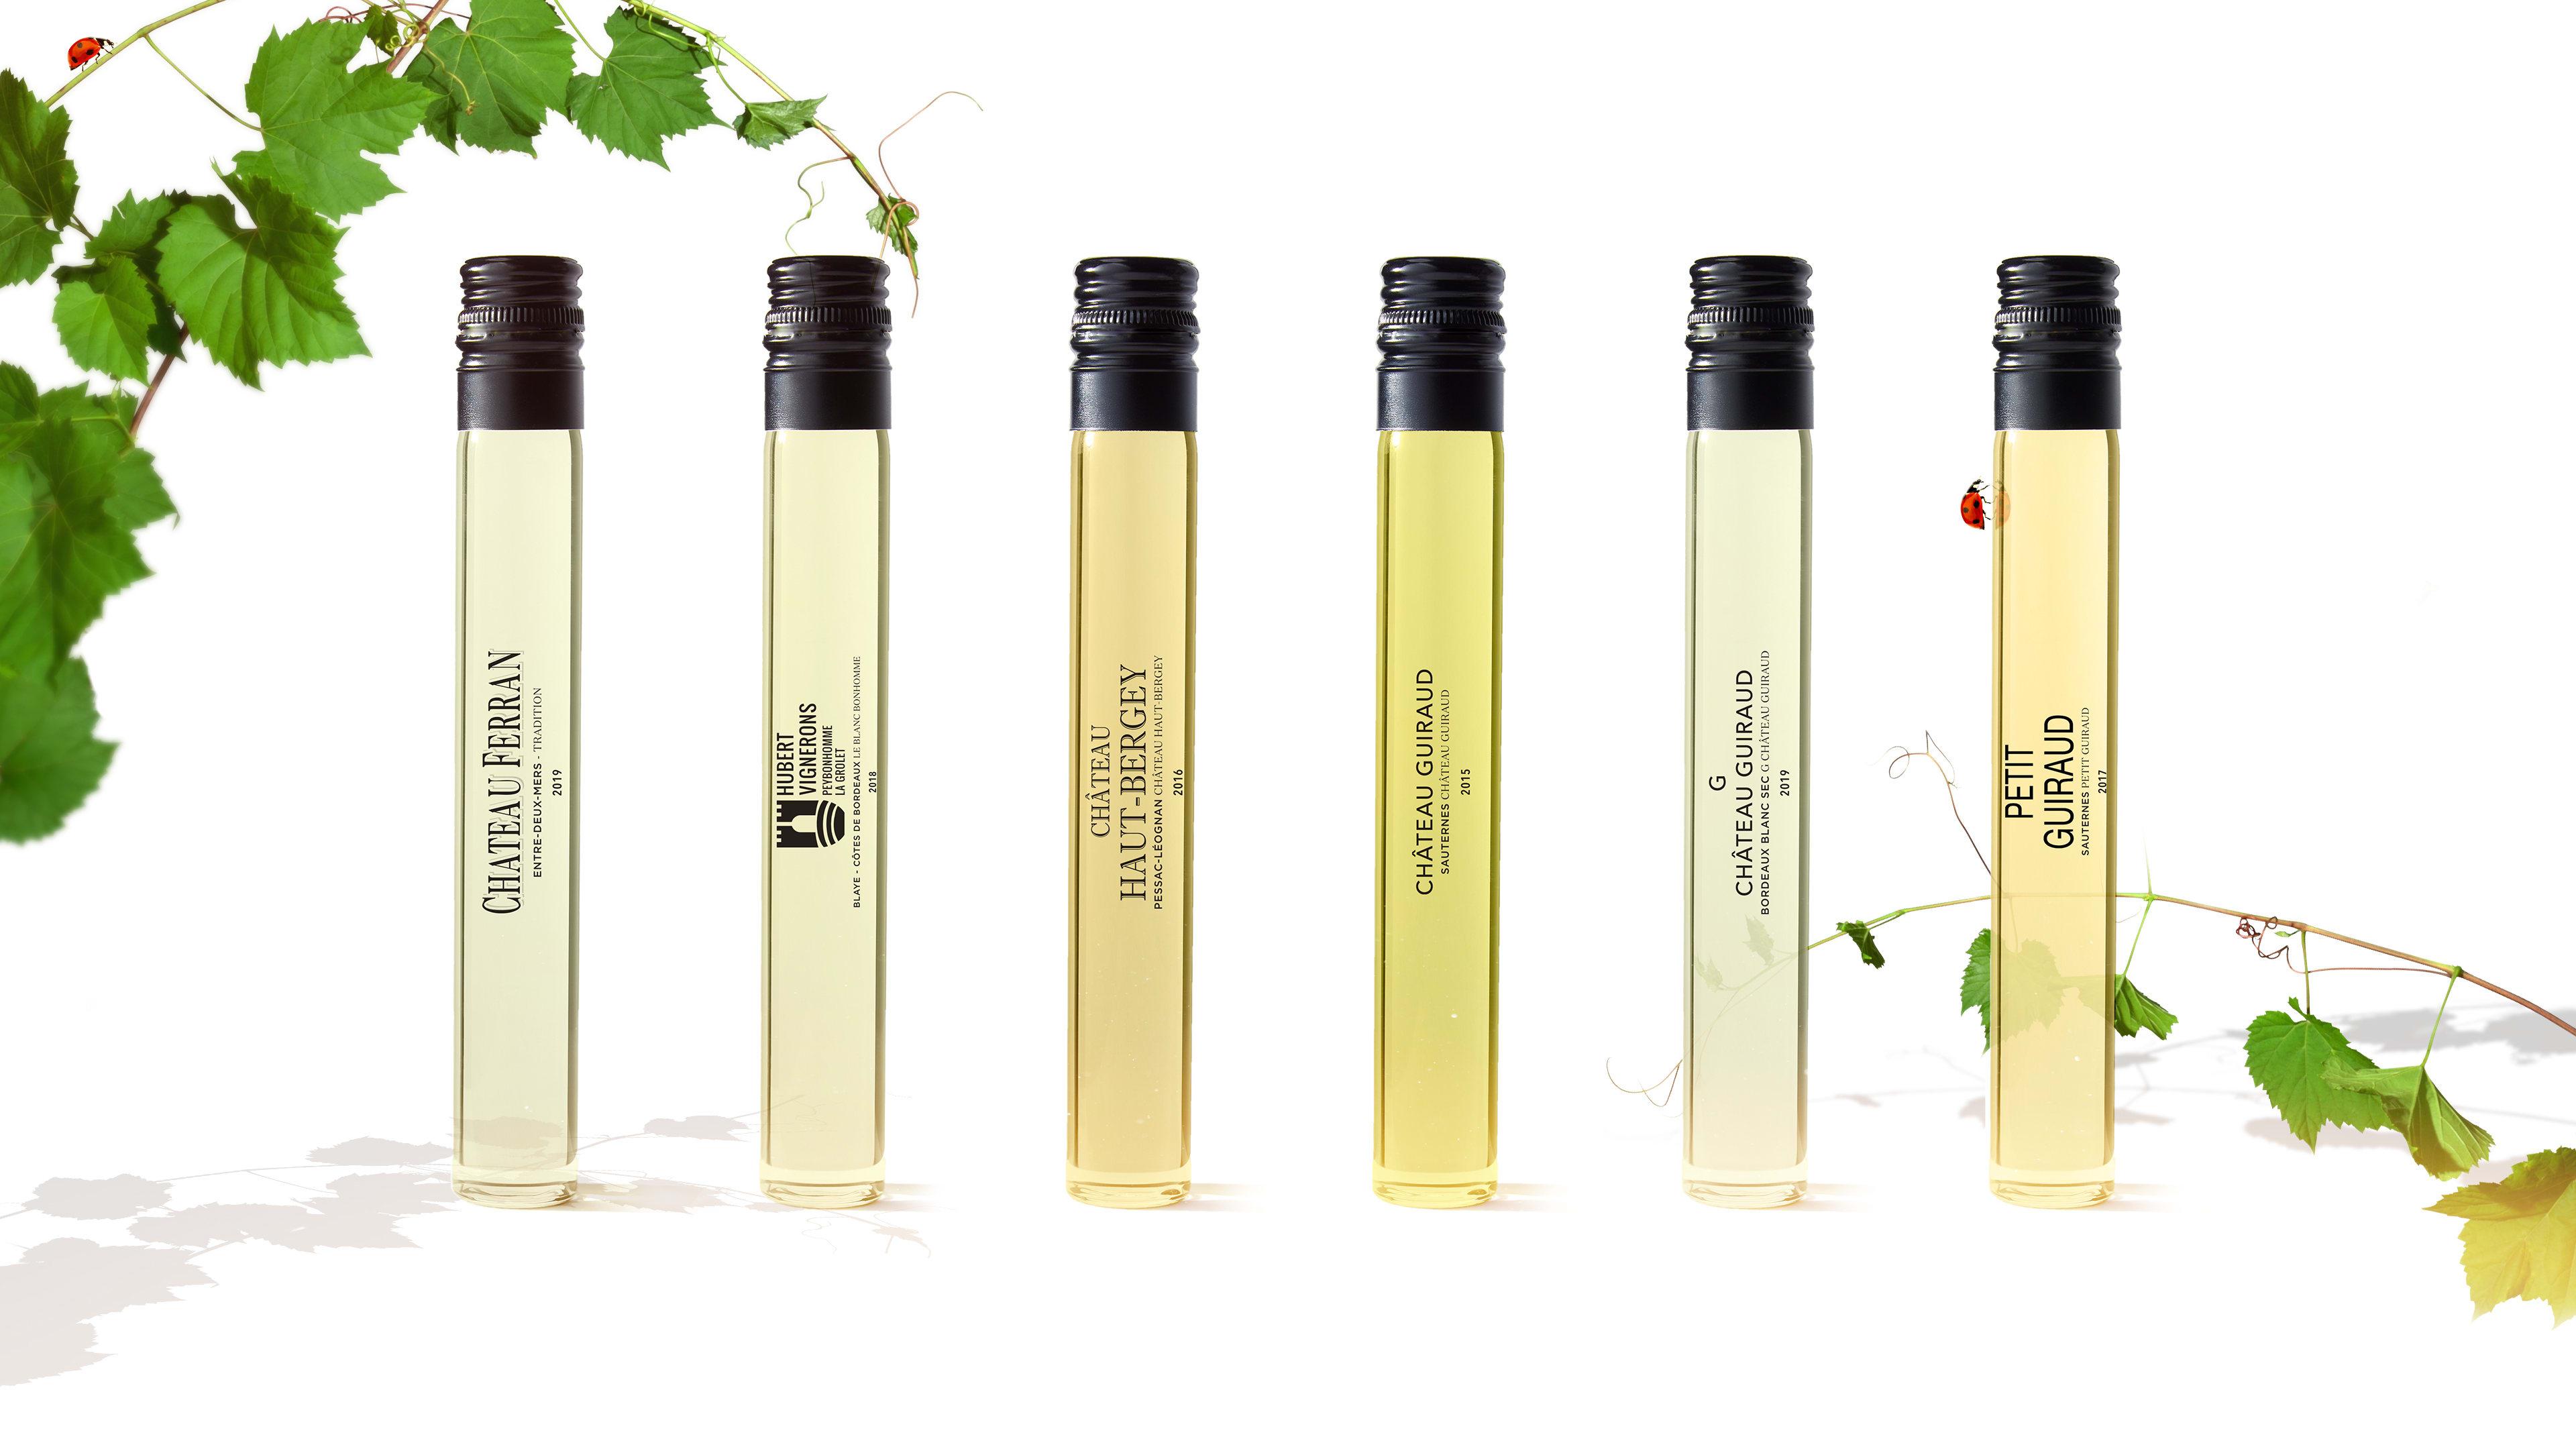 The Many Shades of White Wine